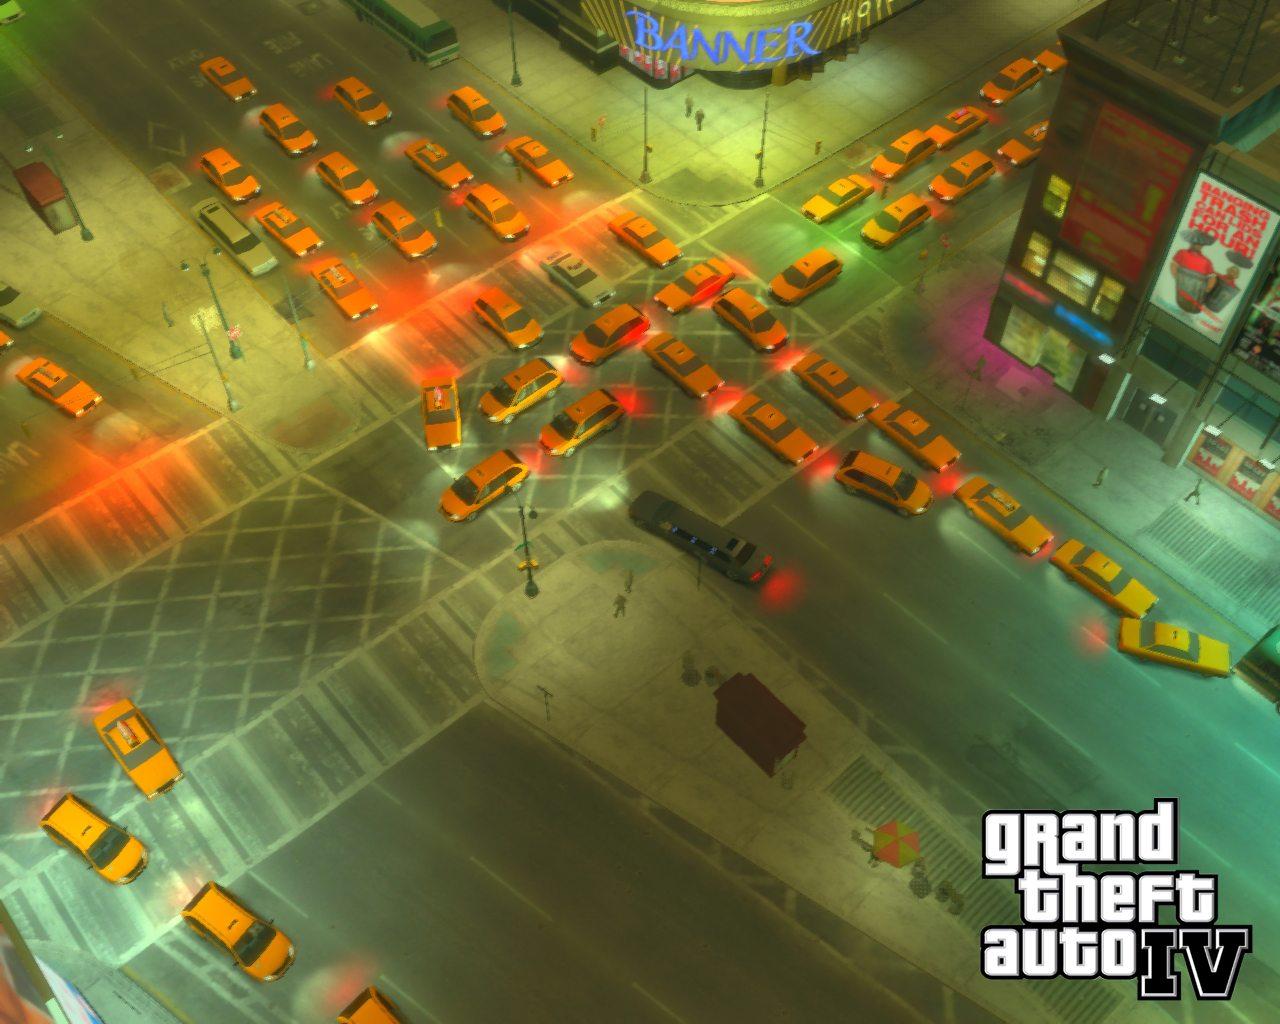 Liberty - Grand Theft Auto 4